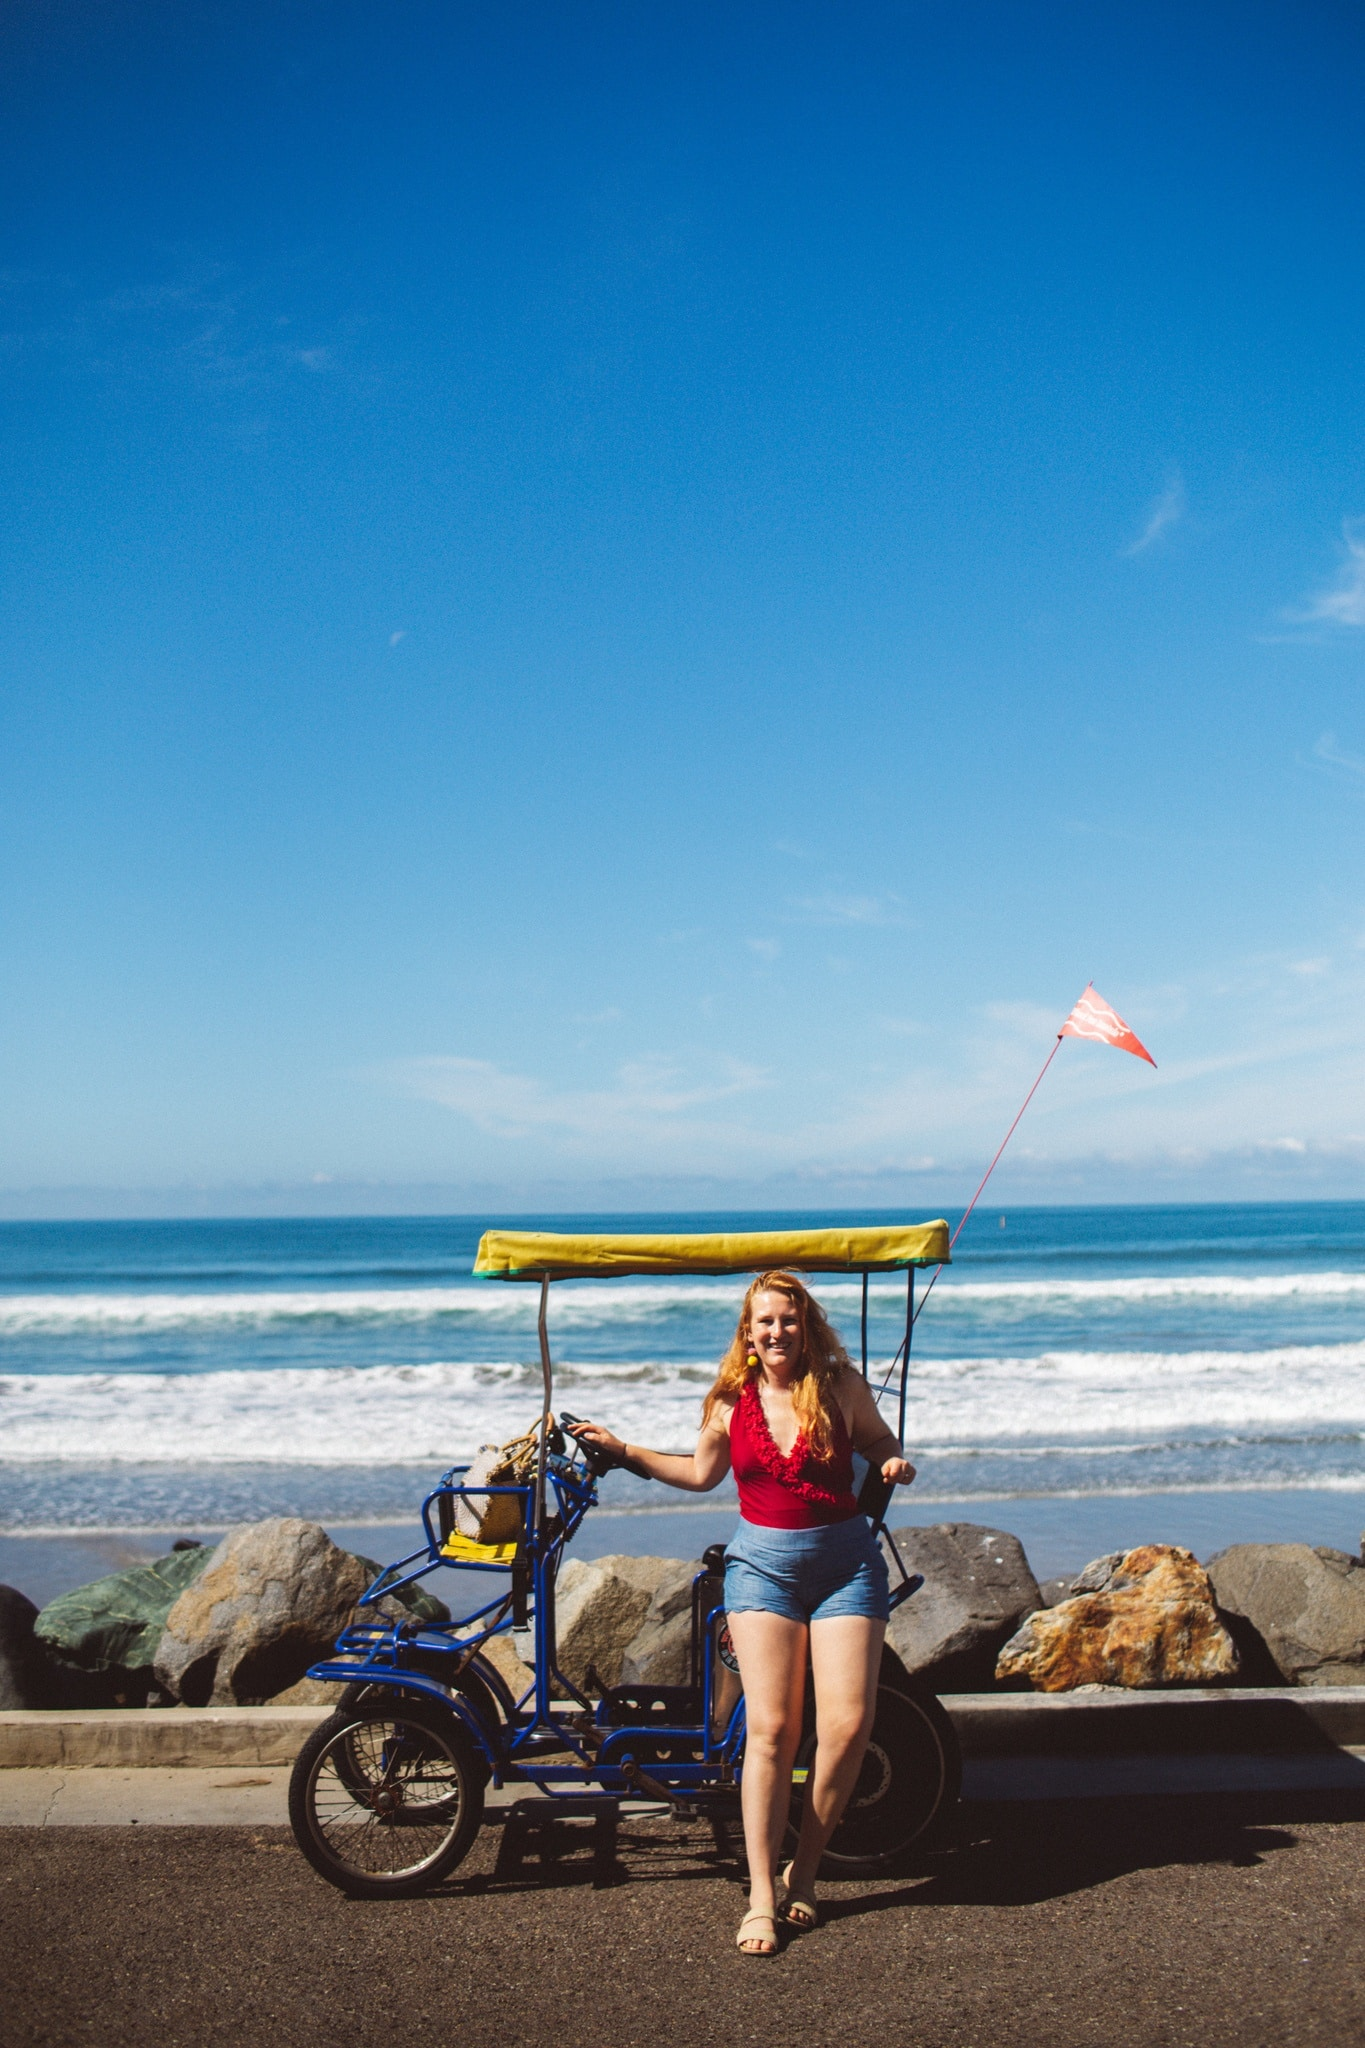 taking this beach cruiser for a ride on the Oceanside, CA beach